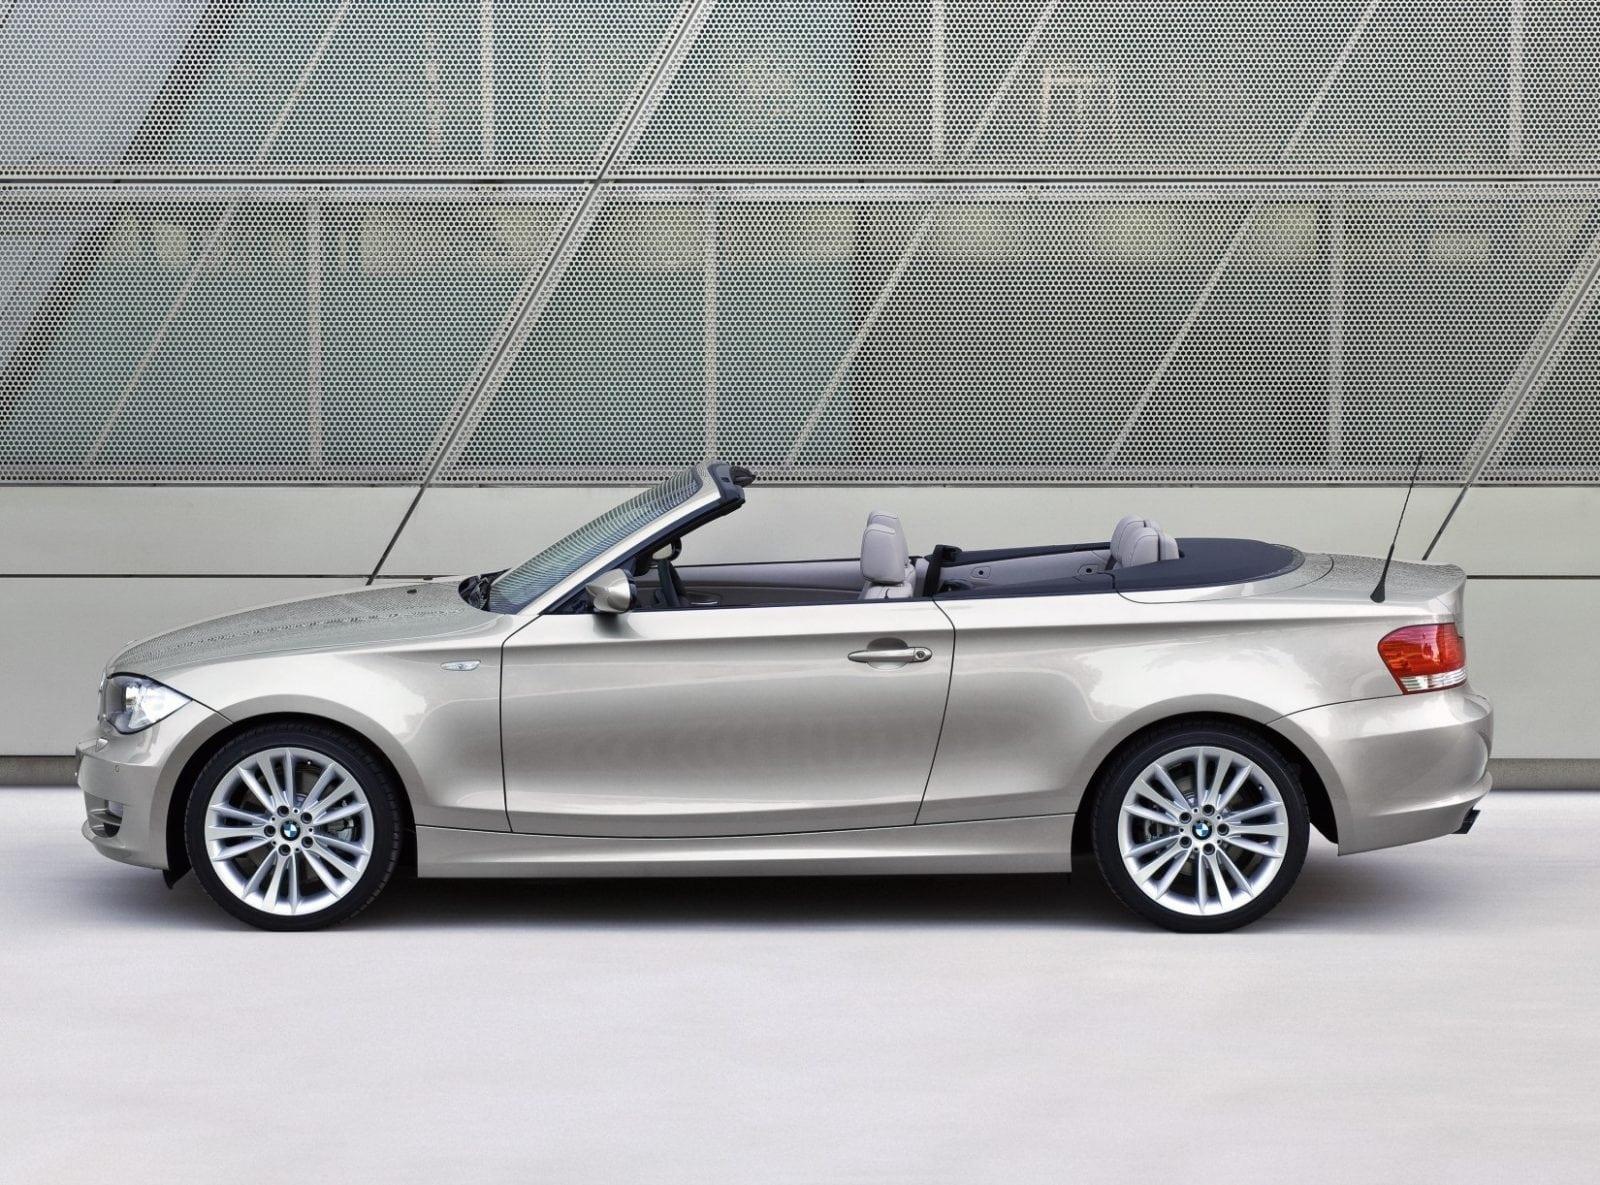 BMW E88 123d Cabrio 2009 Model Year